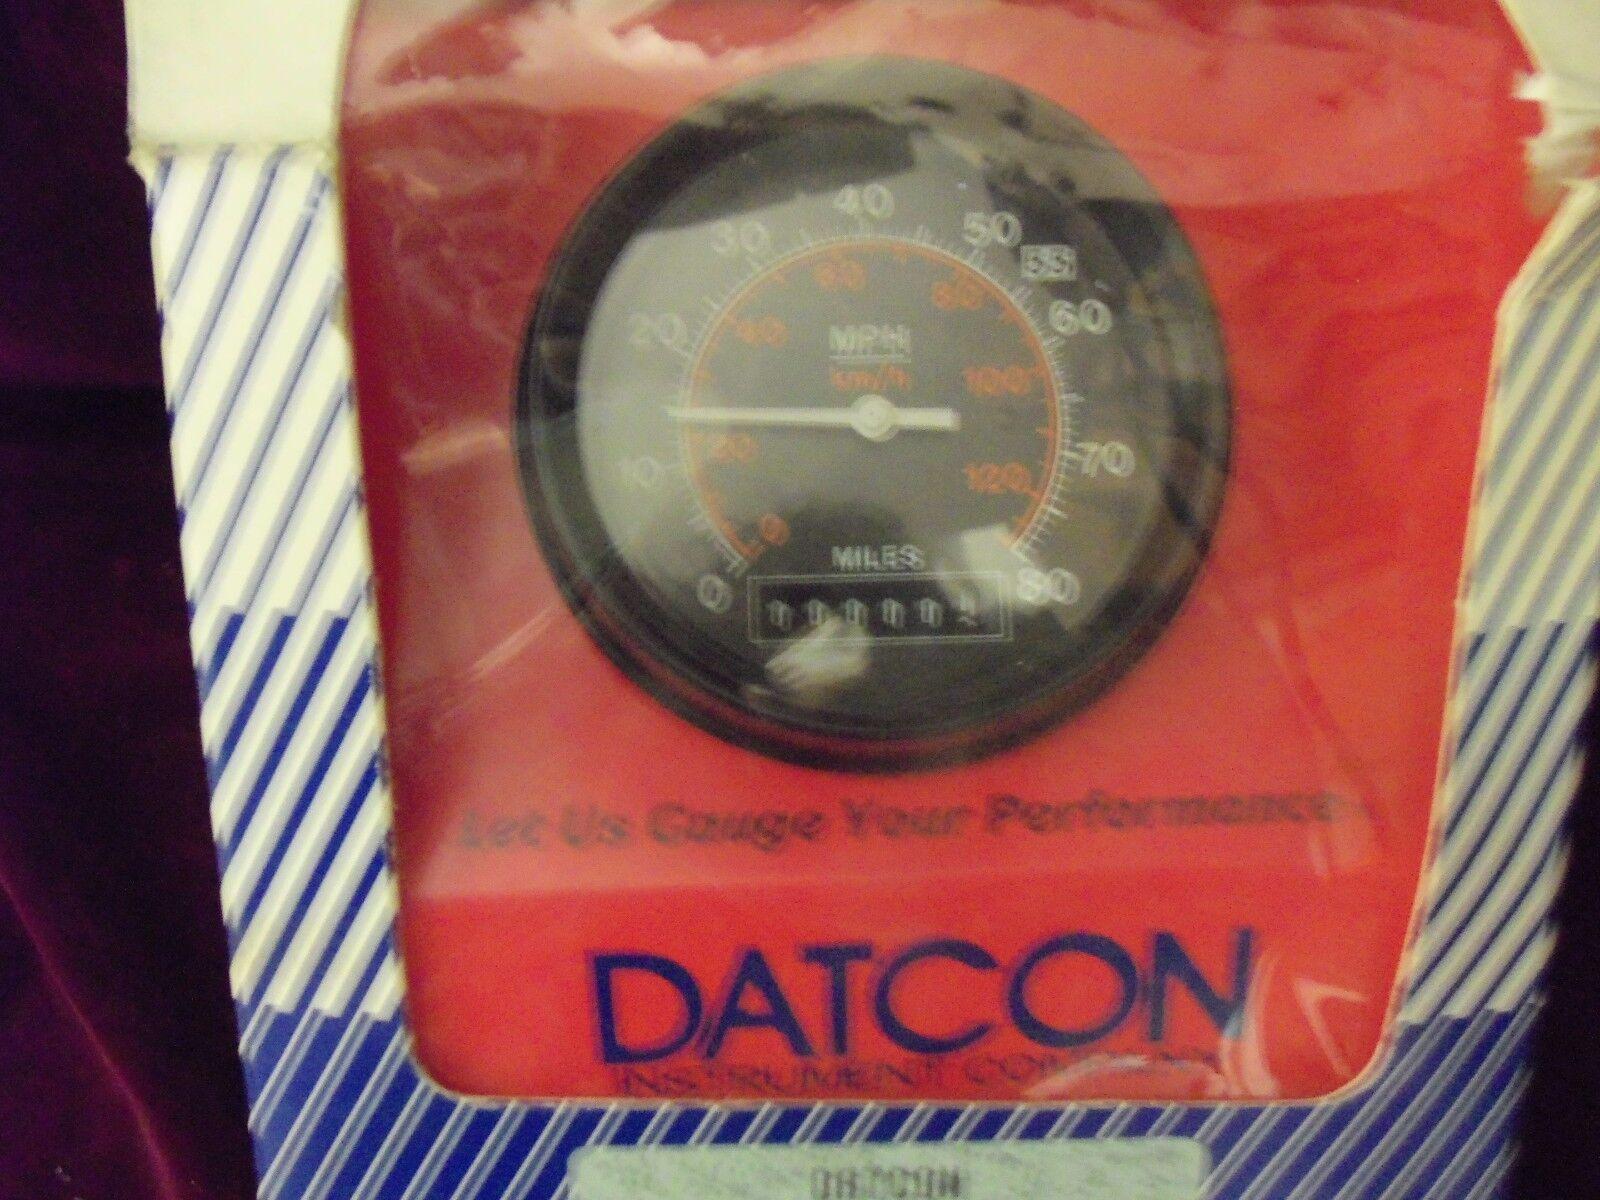 datcon speedometer odometer speedo 24 volt 71927 03 86 semi gauge  norton secured powered by verisign